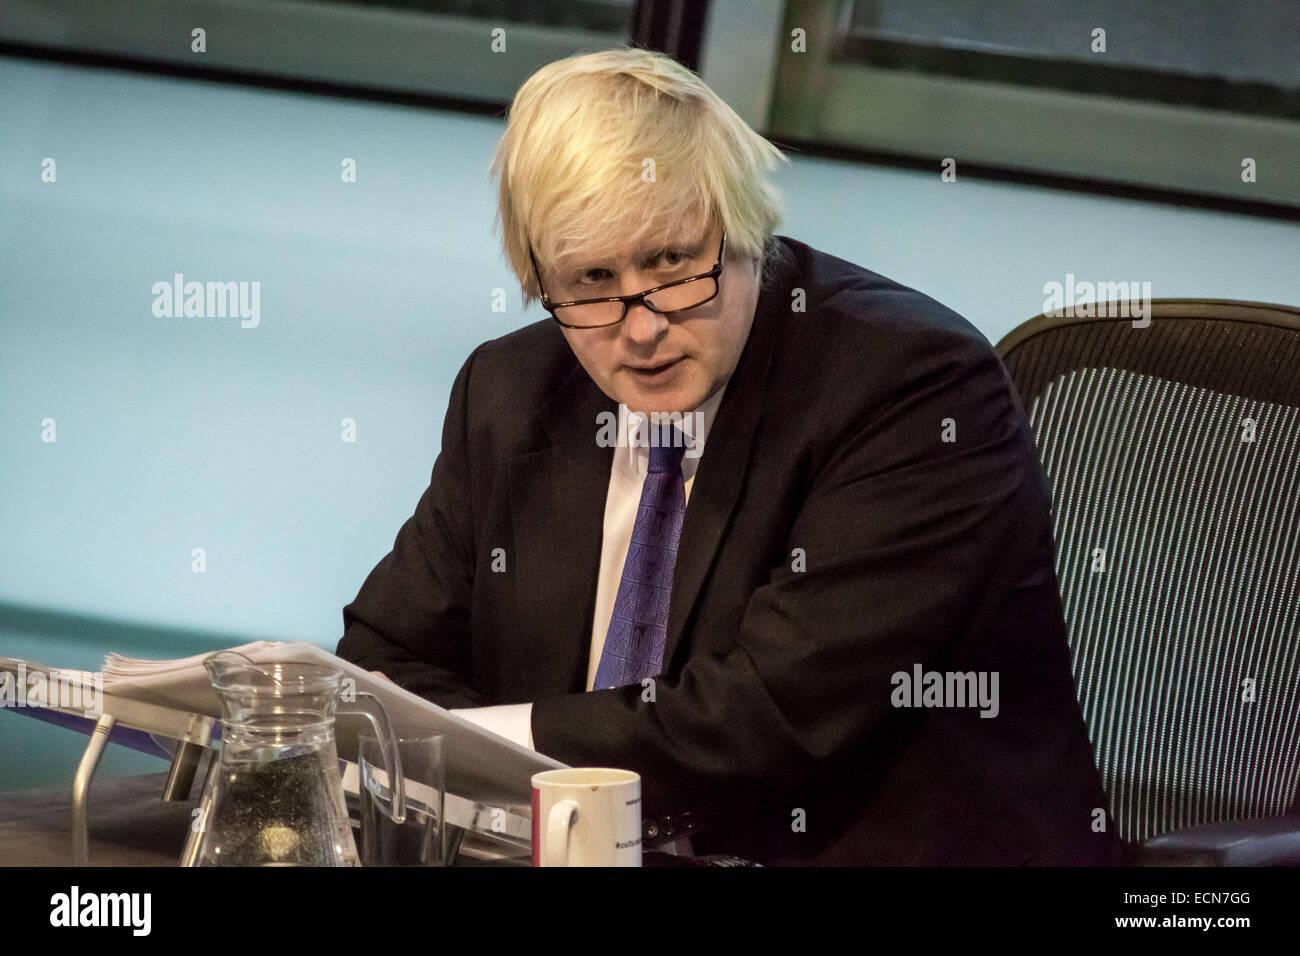 London, UK. 17th Dec, 2014.  Mayor Boris Johnson Question Time at City Hall Credit:  Guy Corbishley/Alamy Live News - Stock Image